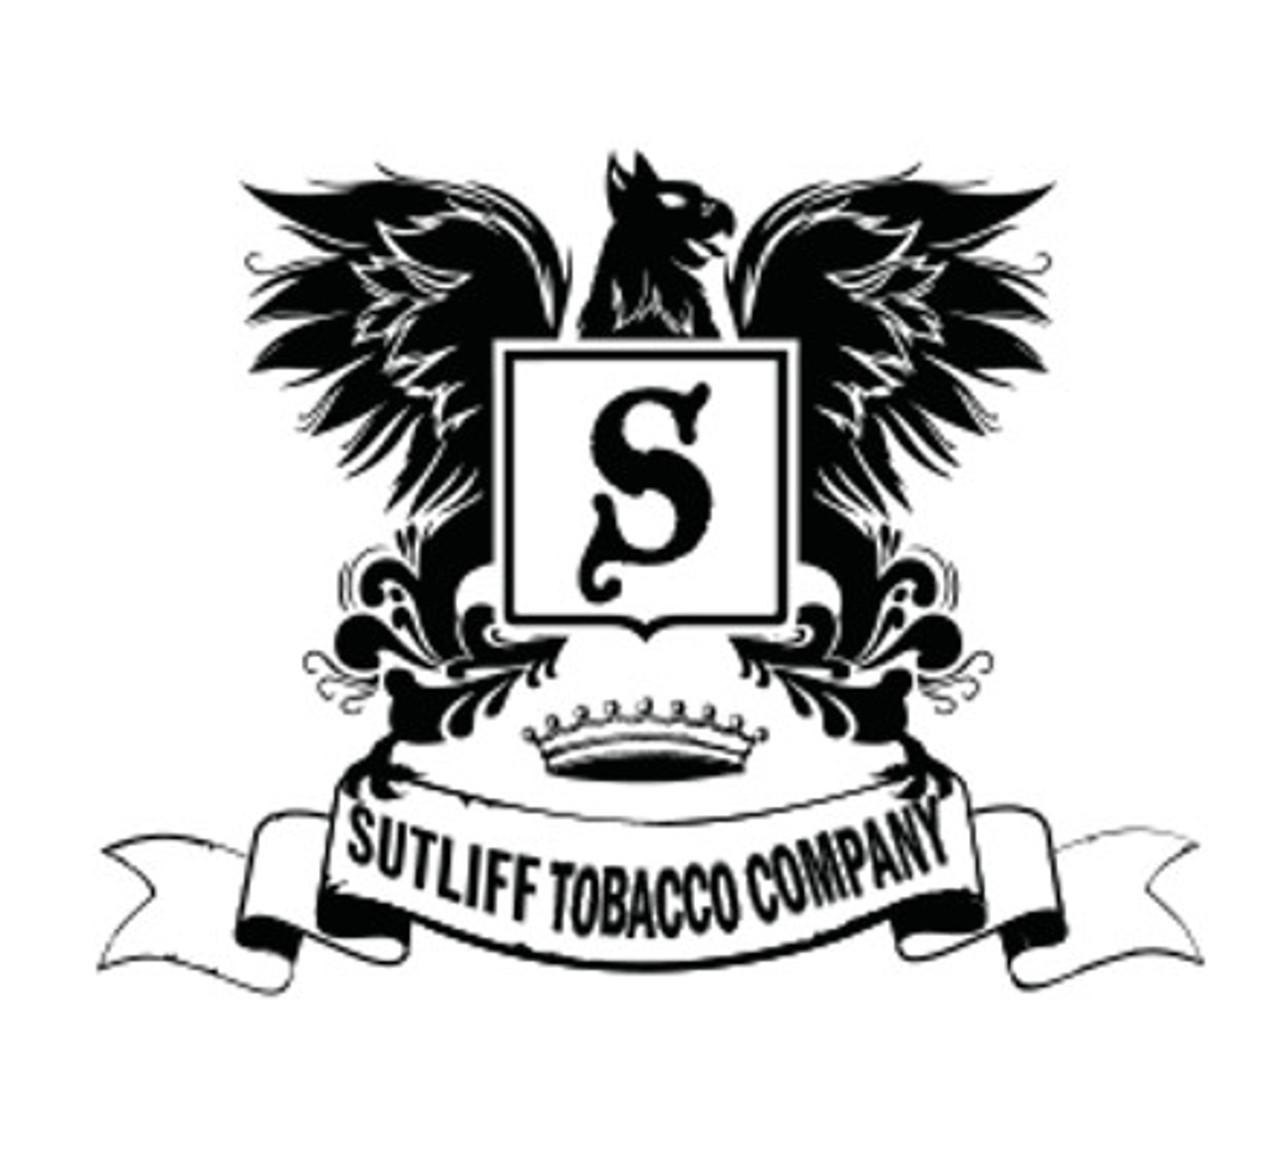 Sutliff B-27 Black & Gold Cavendish Bulk Pipe Tobacco 5 LB